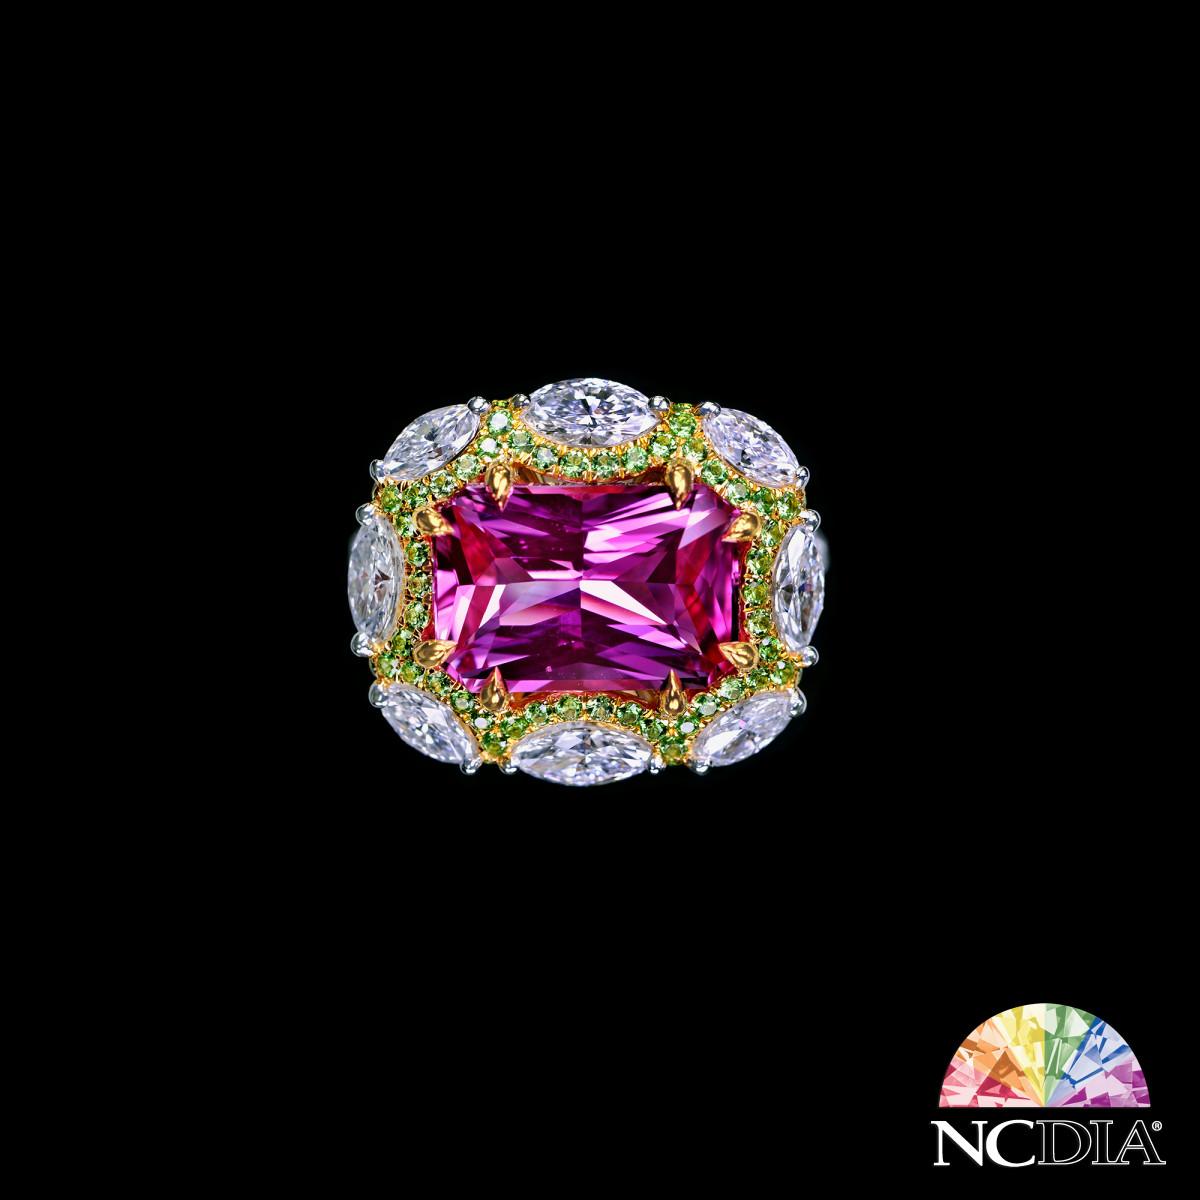 5.78ct Unheated Vivid Pink Sri Lankan Sapphire Diamond Ring, GRS & CIA certs ava.